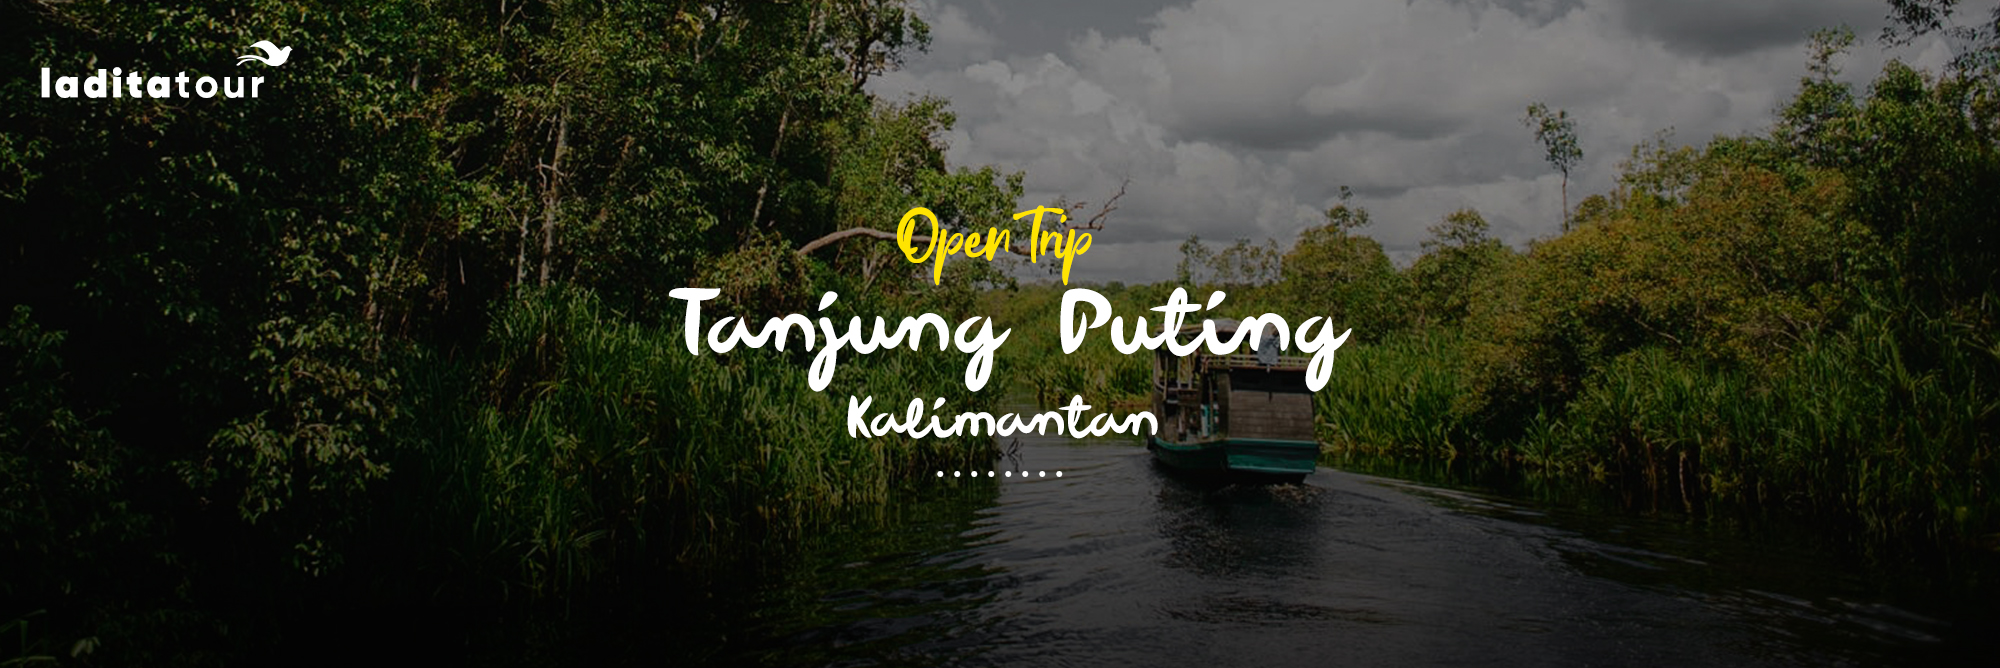 Open Trip Tanjung Puting